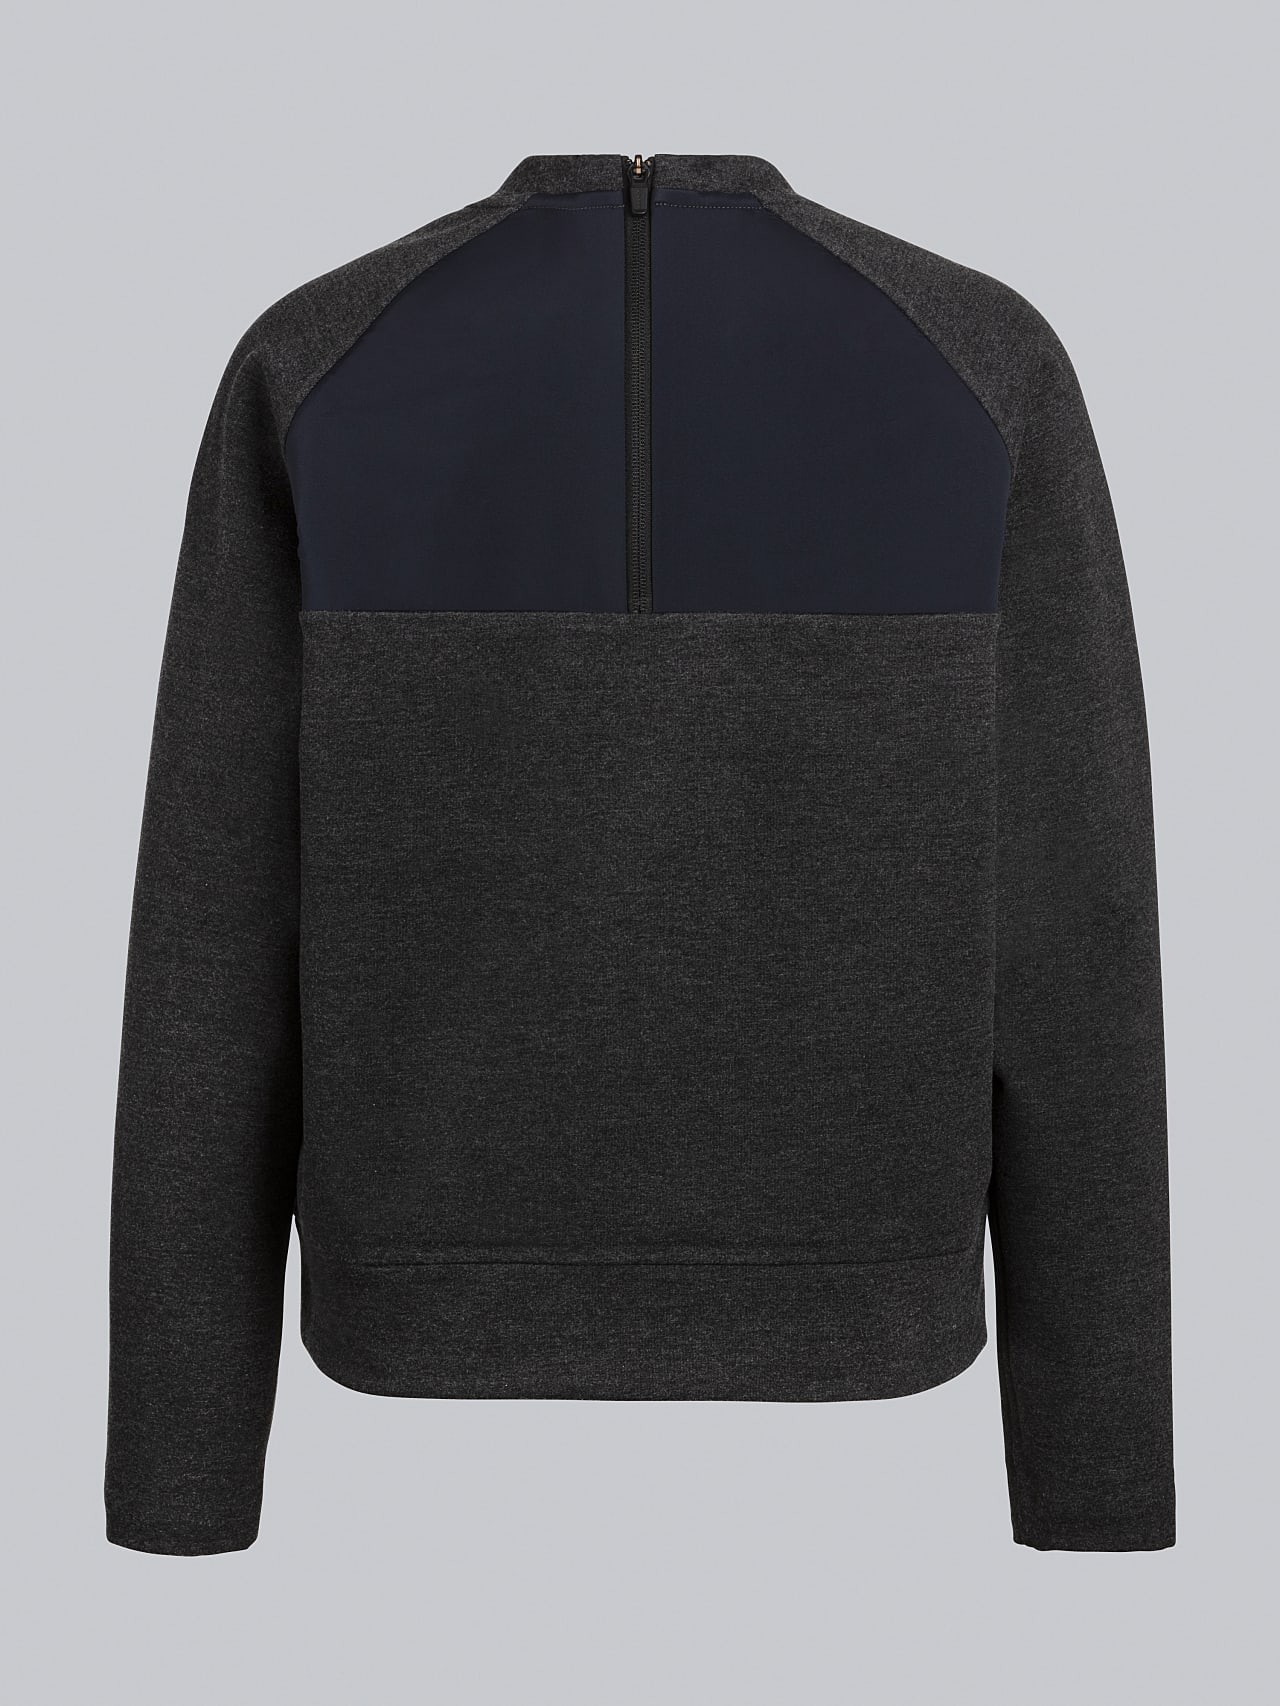 SRONI V2.Y5.02 Waterproof Sweatshirt dark grey / anthracite Left Alpha Tauri